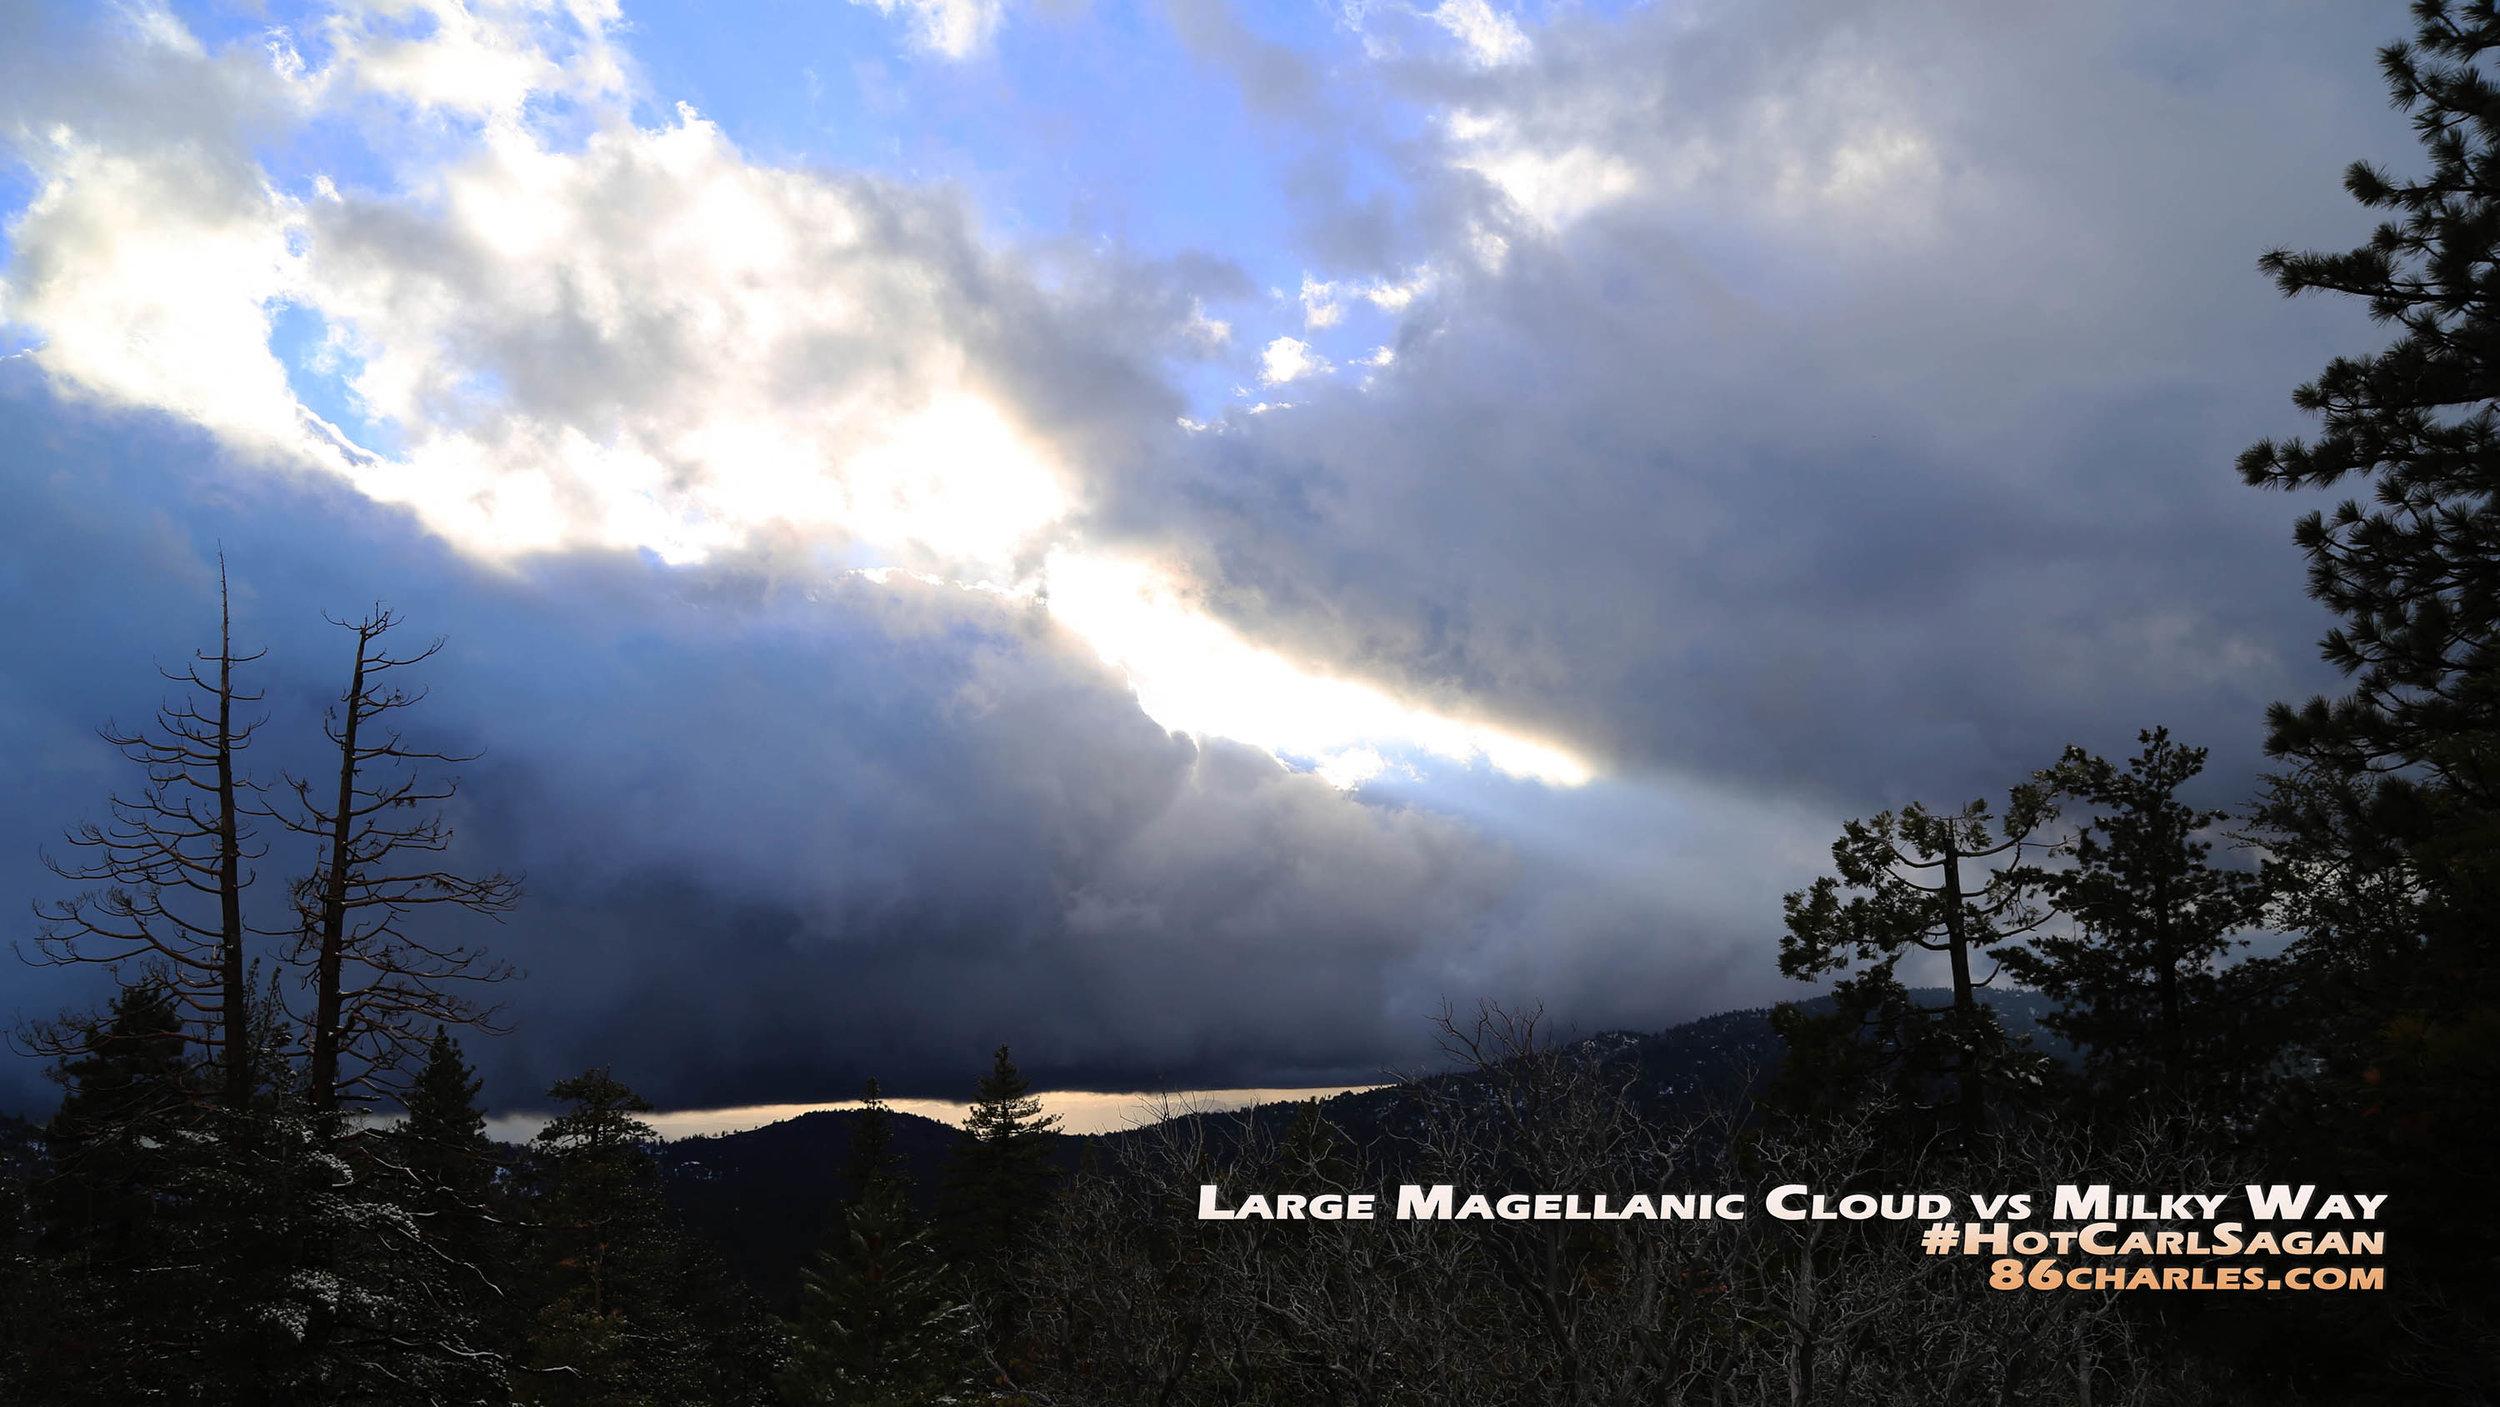 Large Magellanic Cloud vs Milky Way #HotCarlSagan